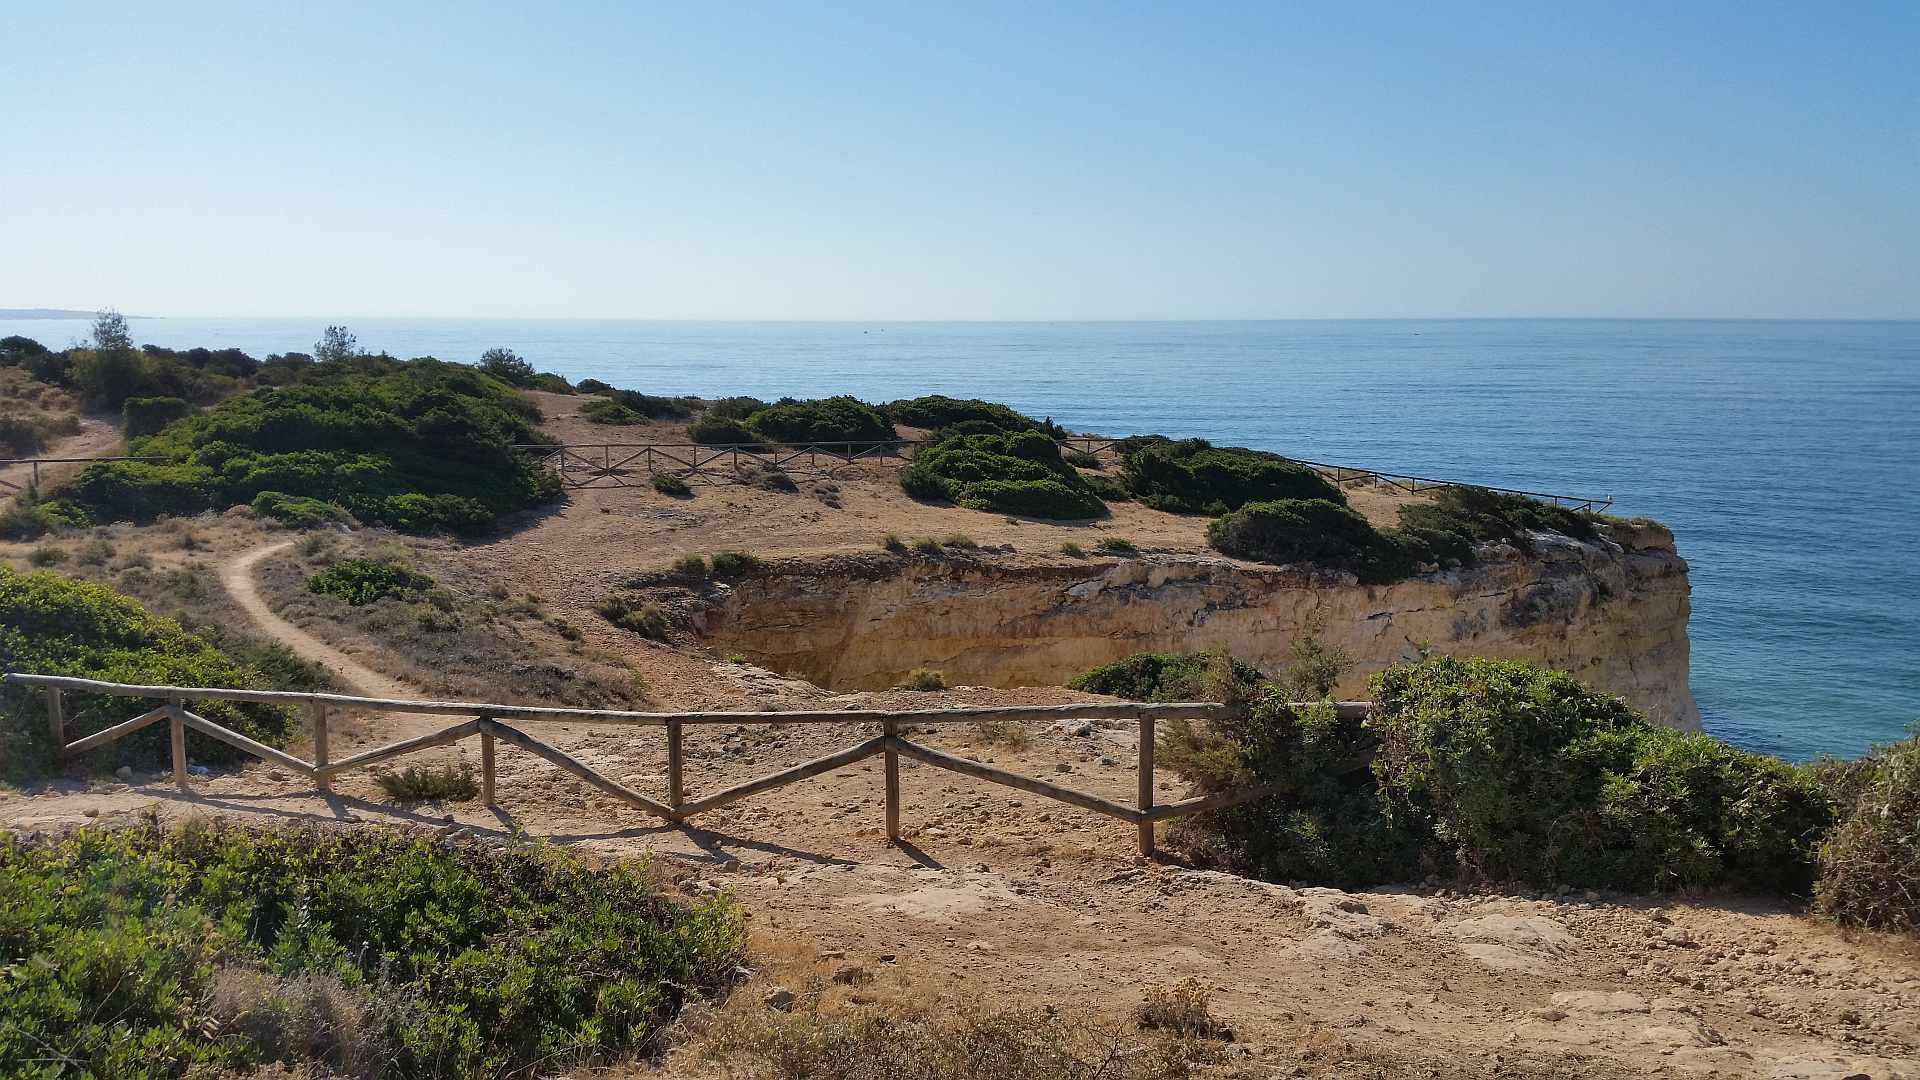 Lagao - Algarve - the path between beaches